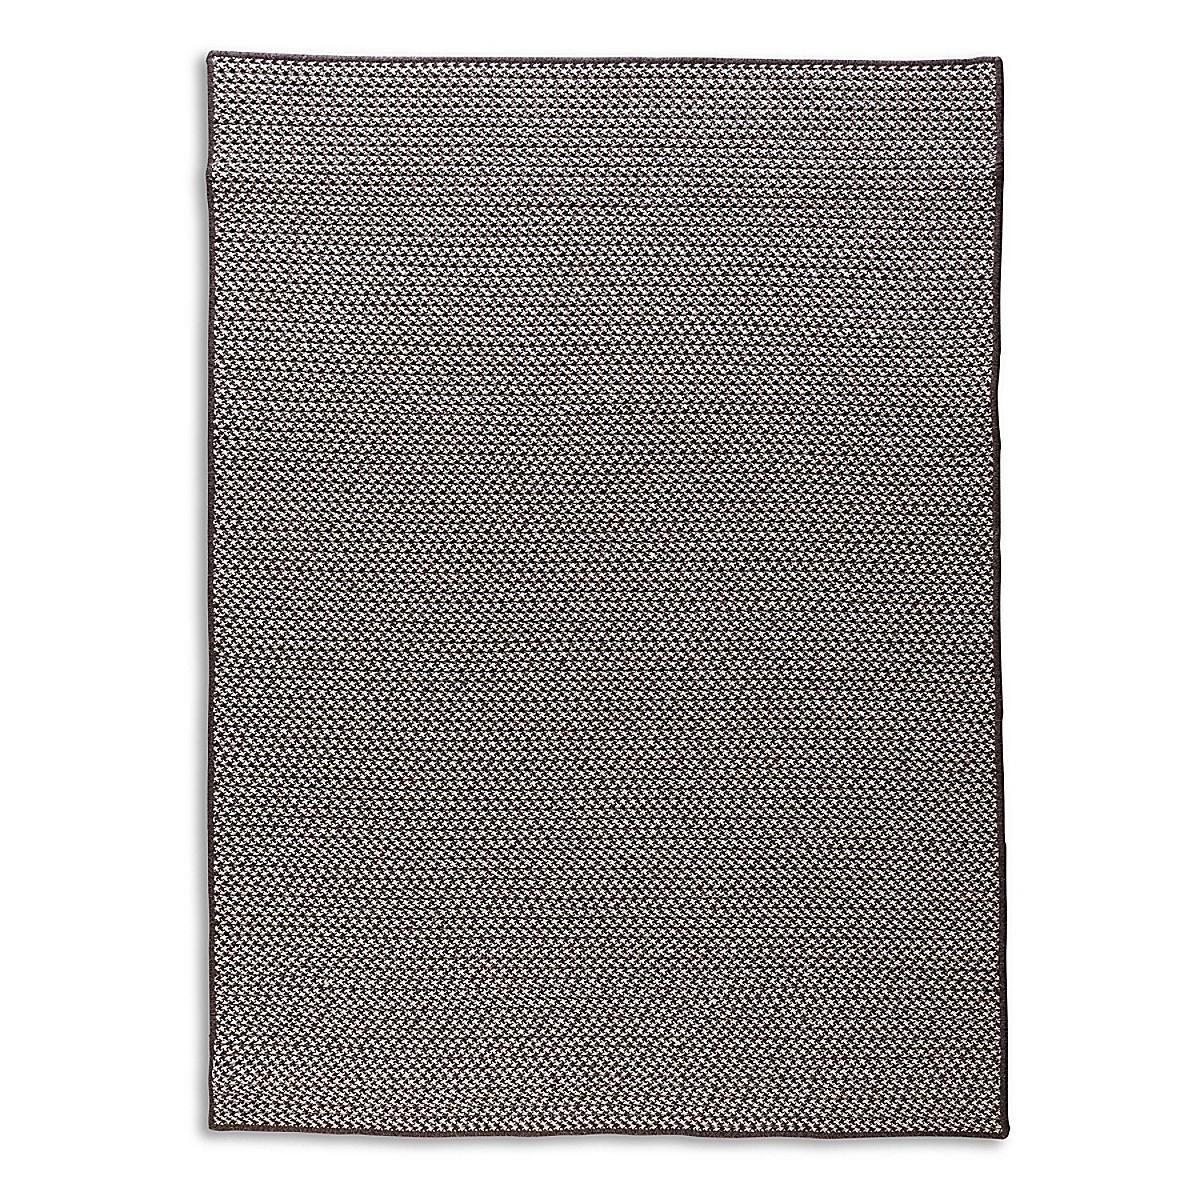 Houndstooth Wool Rug - Charcoal